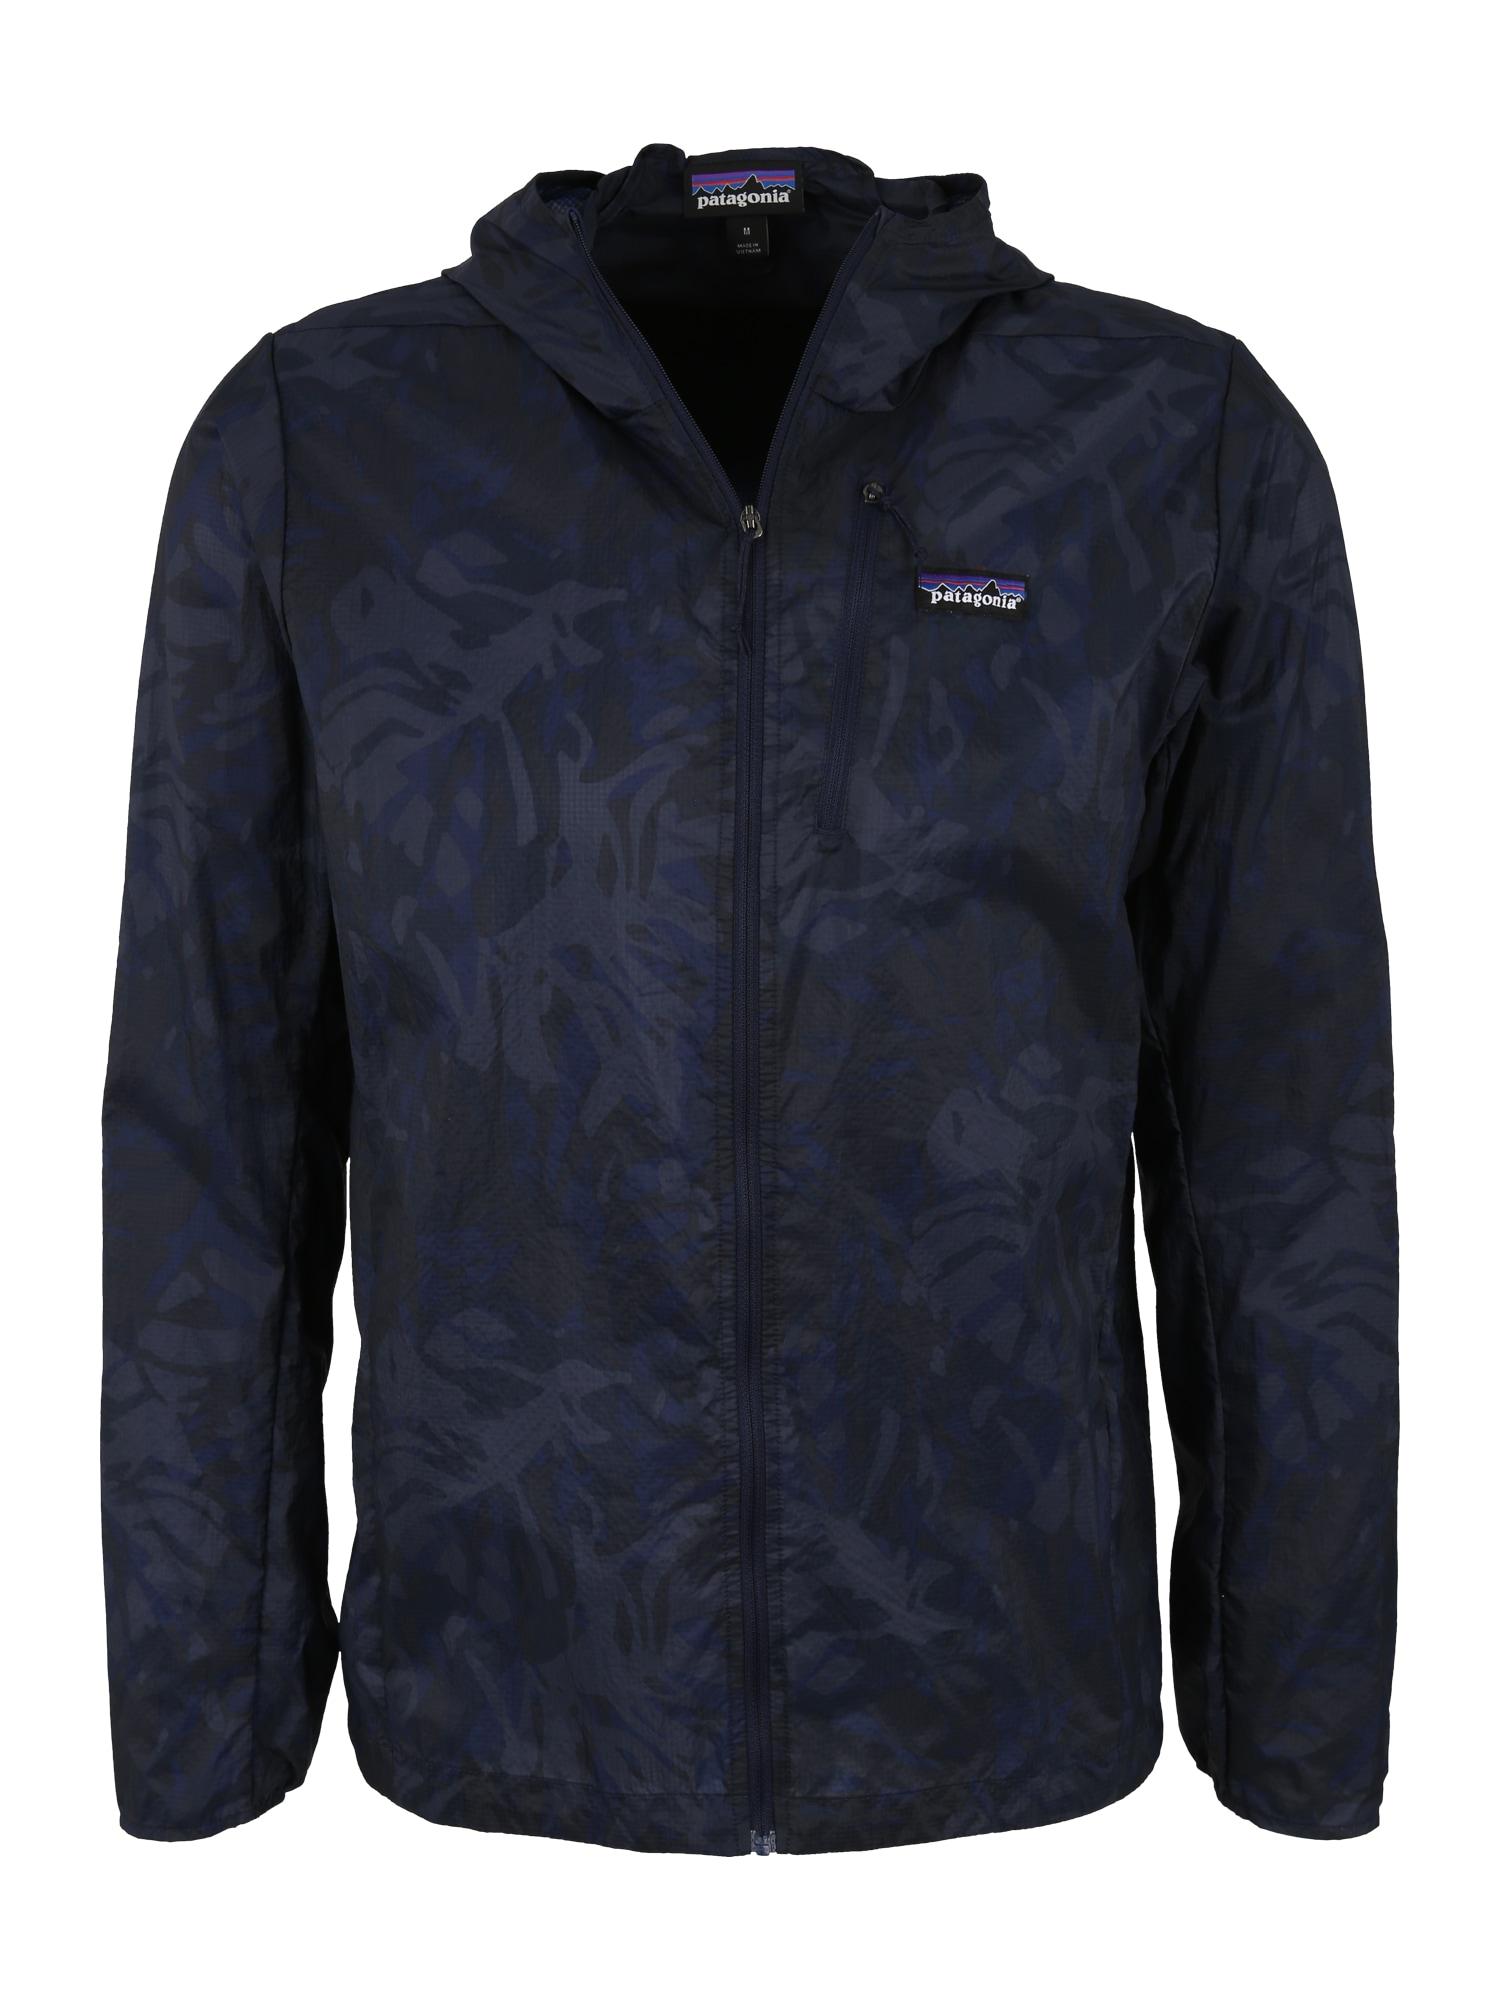 Outdoorová bunda Ms Houdini námořnická modř PATAGONIA